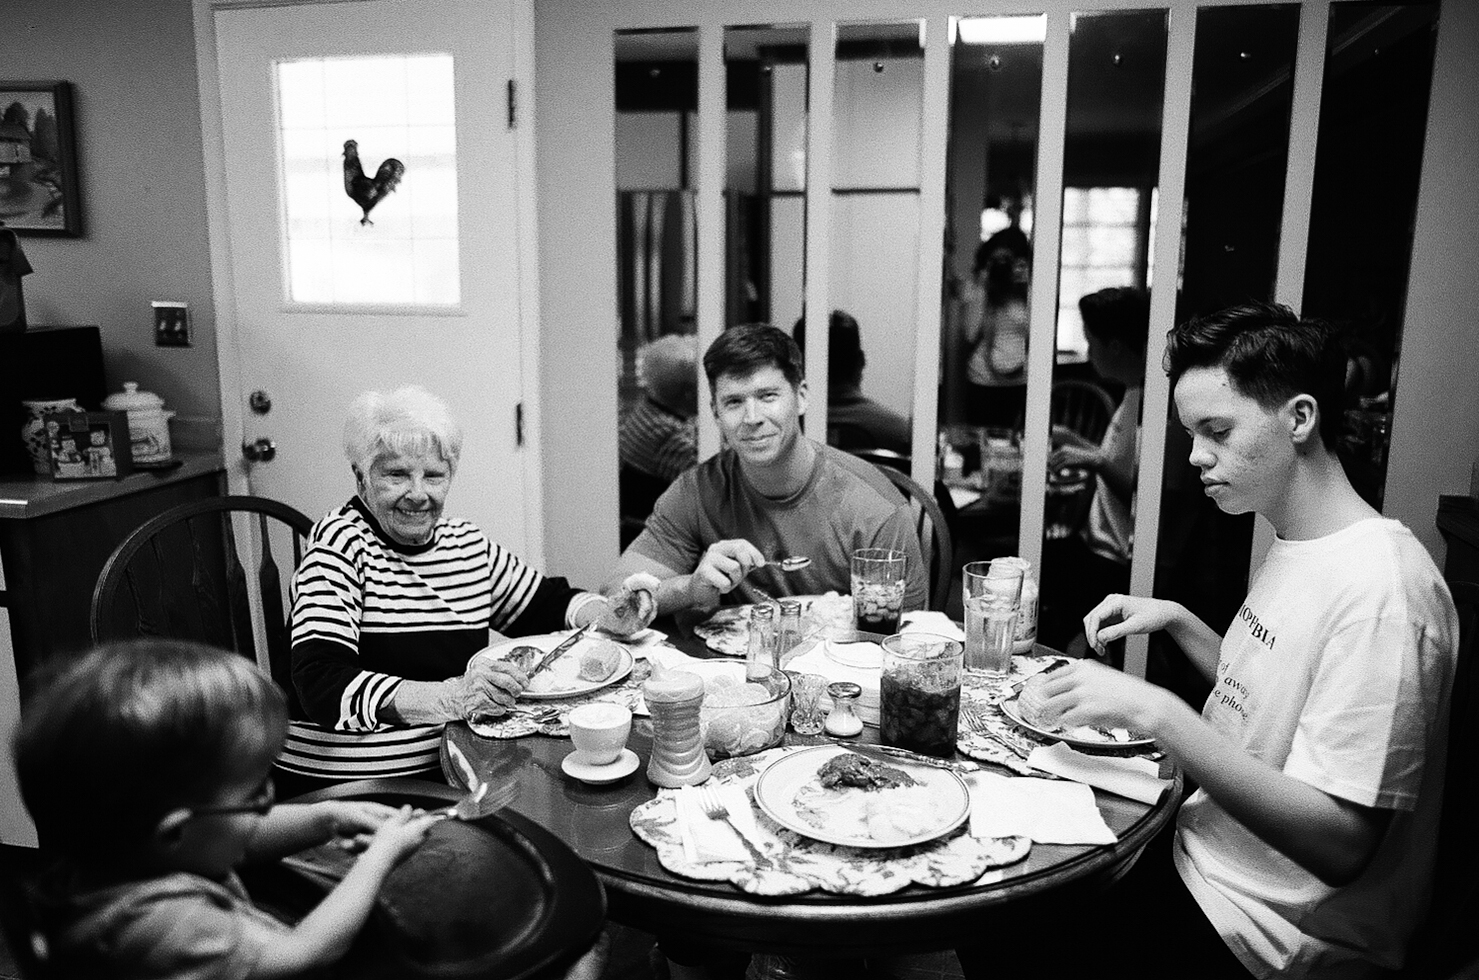 dinner with grandma jean. shot on tri-x.